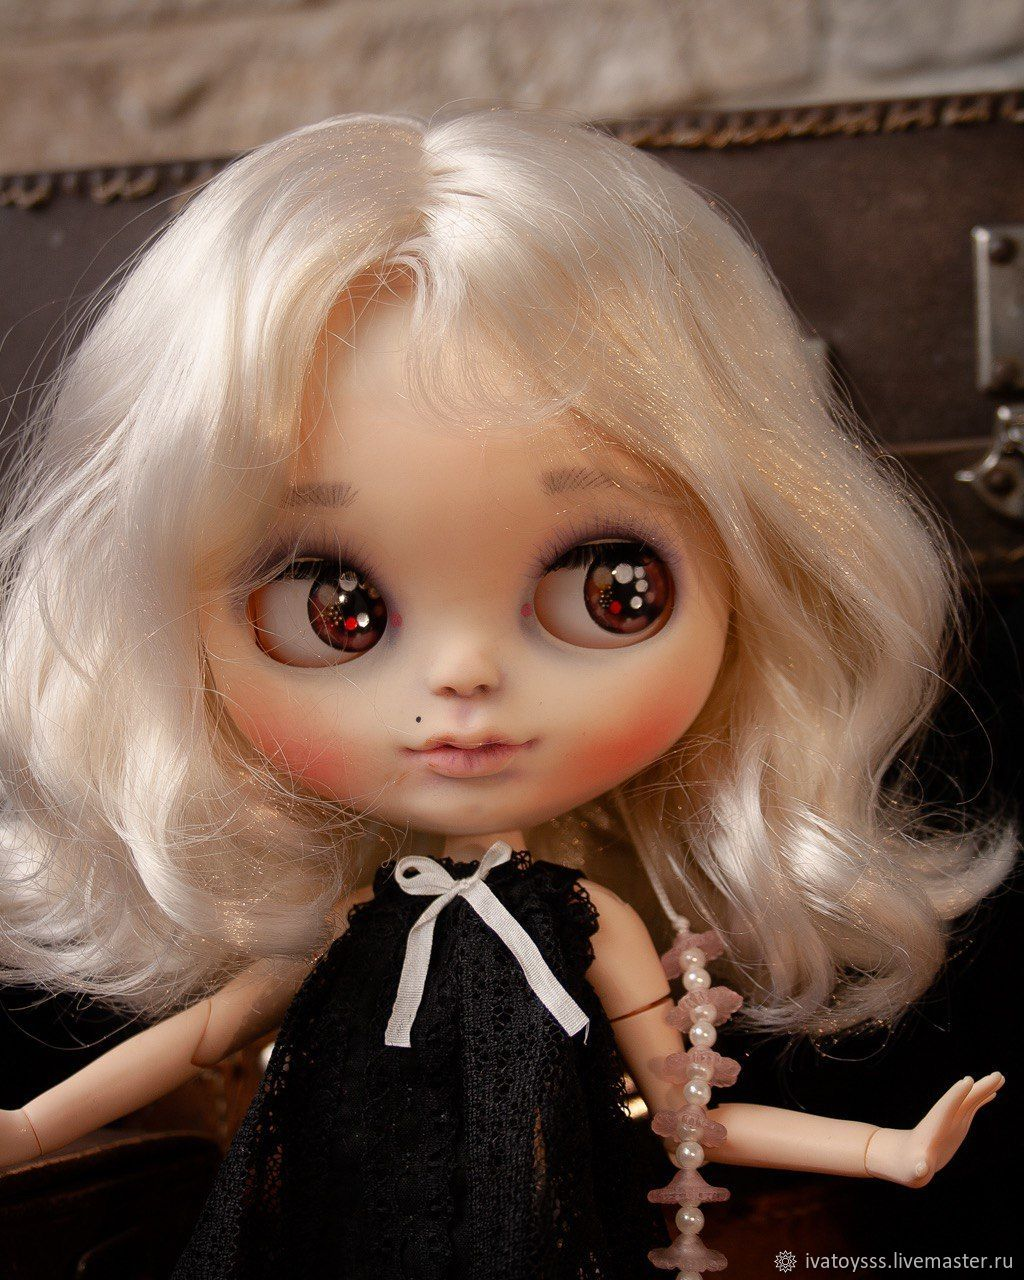 Куклы: Кастом блайз ТБЛ Gnomushka, Винтажные куклы и игрушки, Уфа, Фото №1